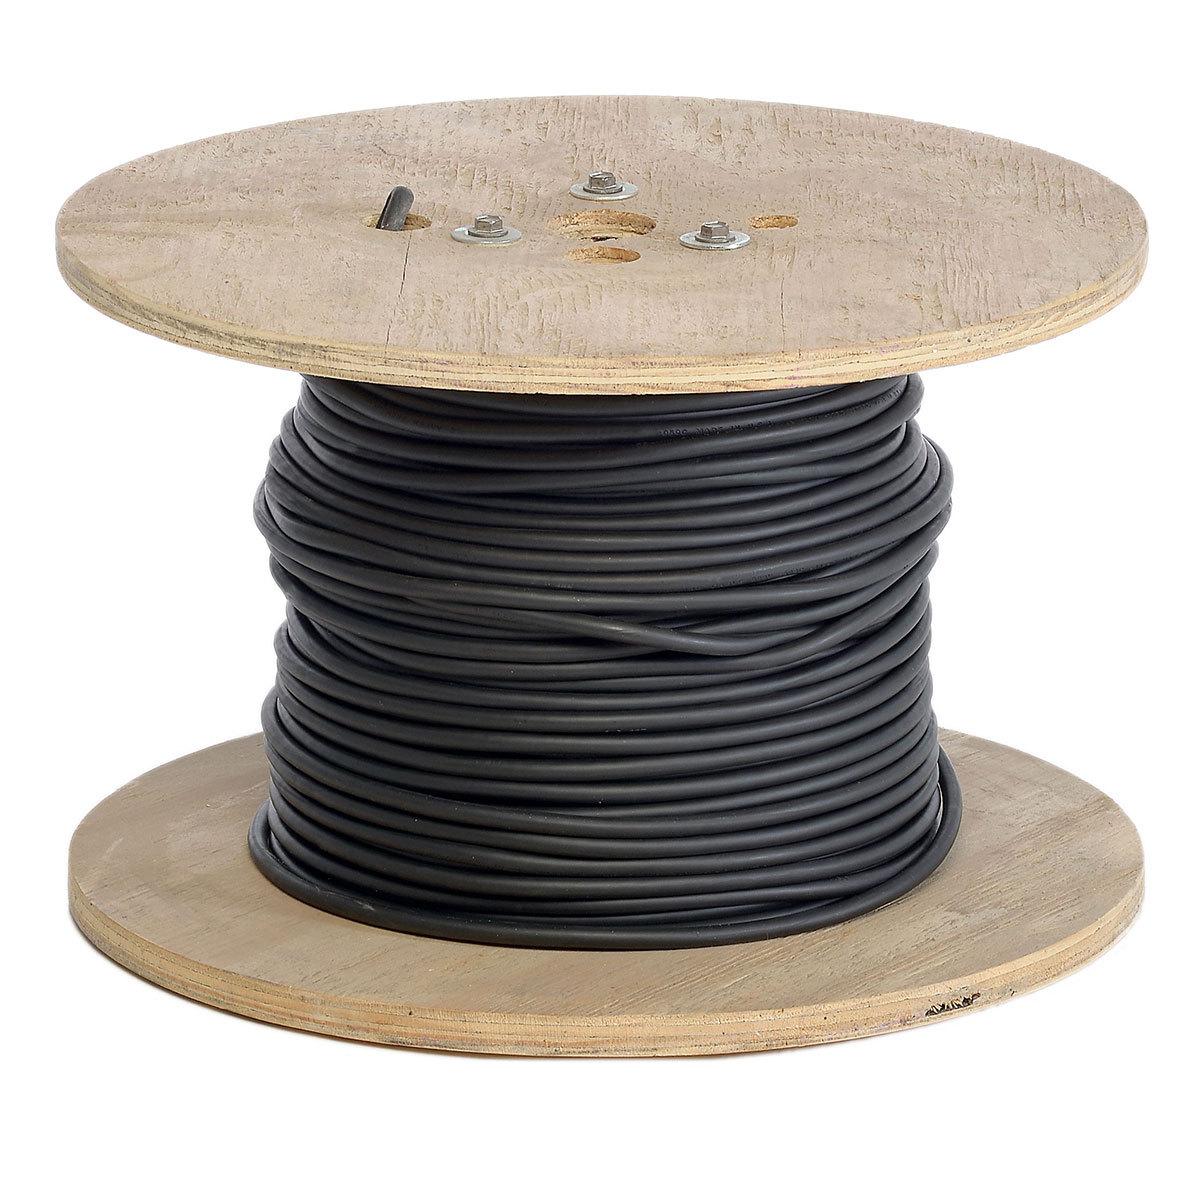 Airgas dirfp83 250bl direct wire cable 83 black welding direct wire cable 83 black welding cable 250 reel keyboard keysfo Images